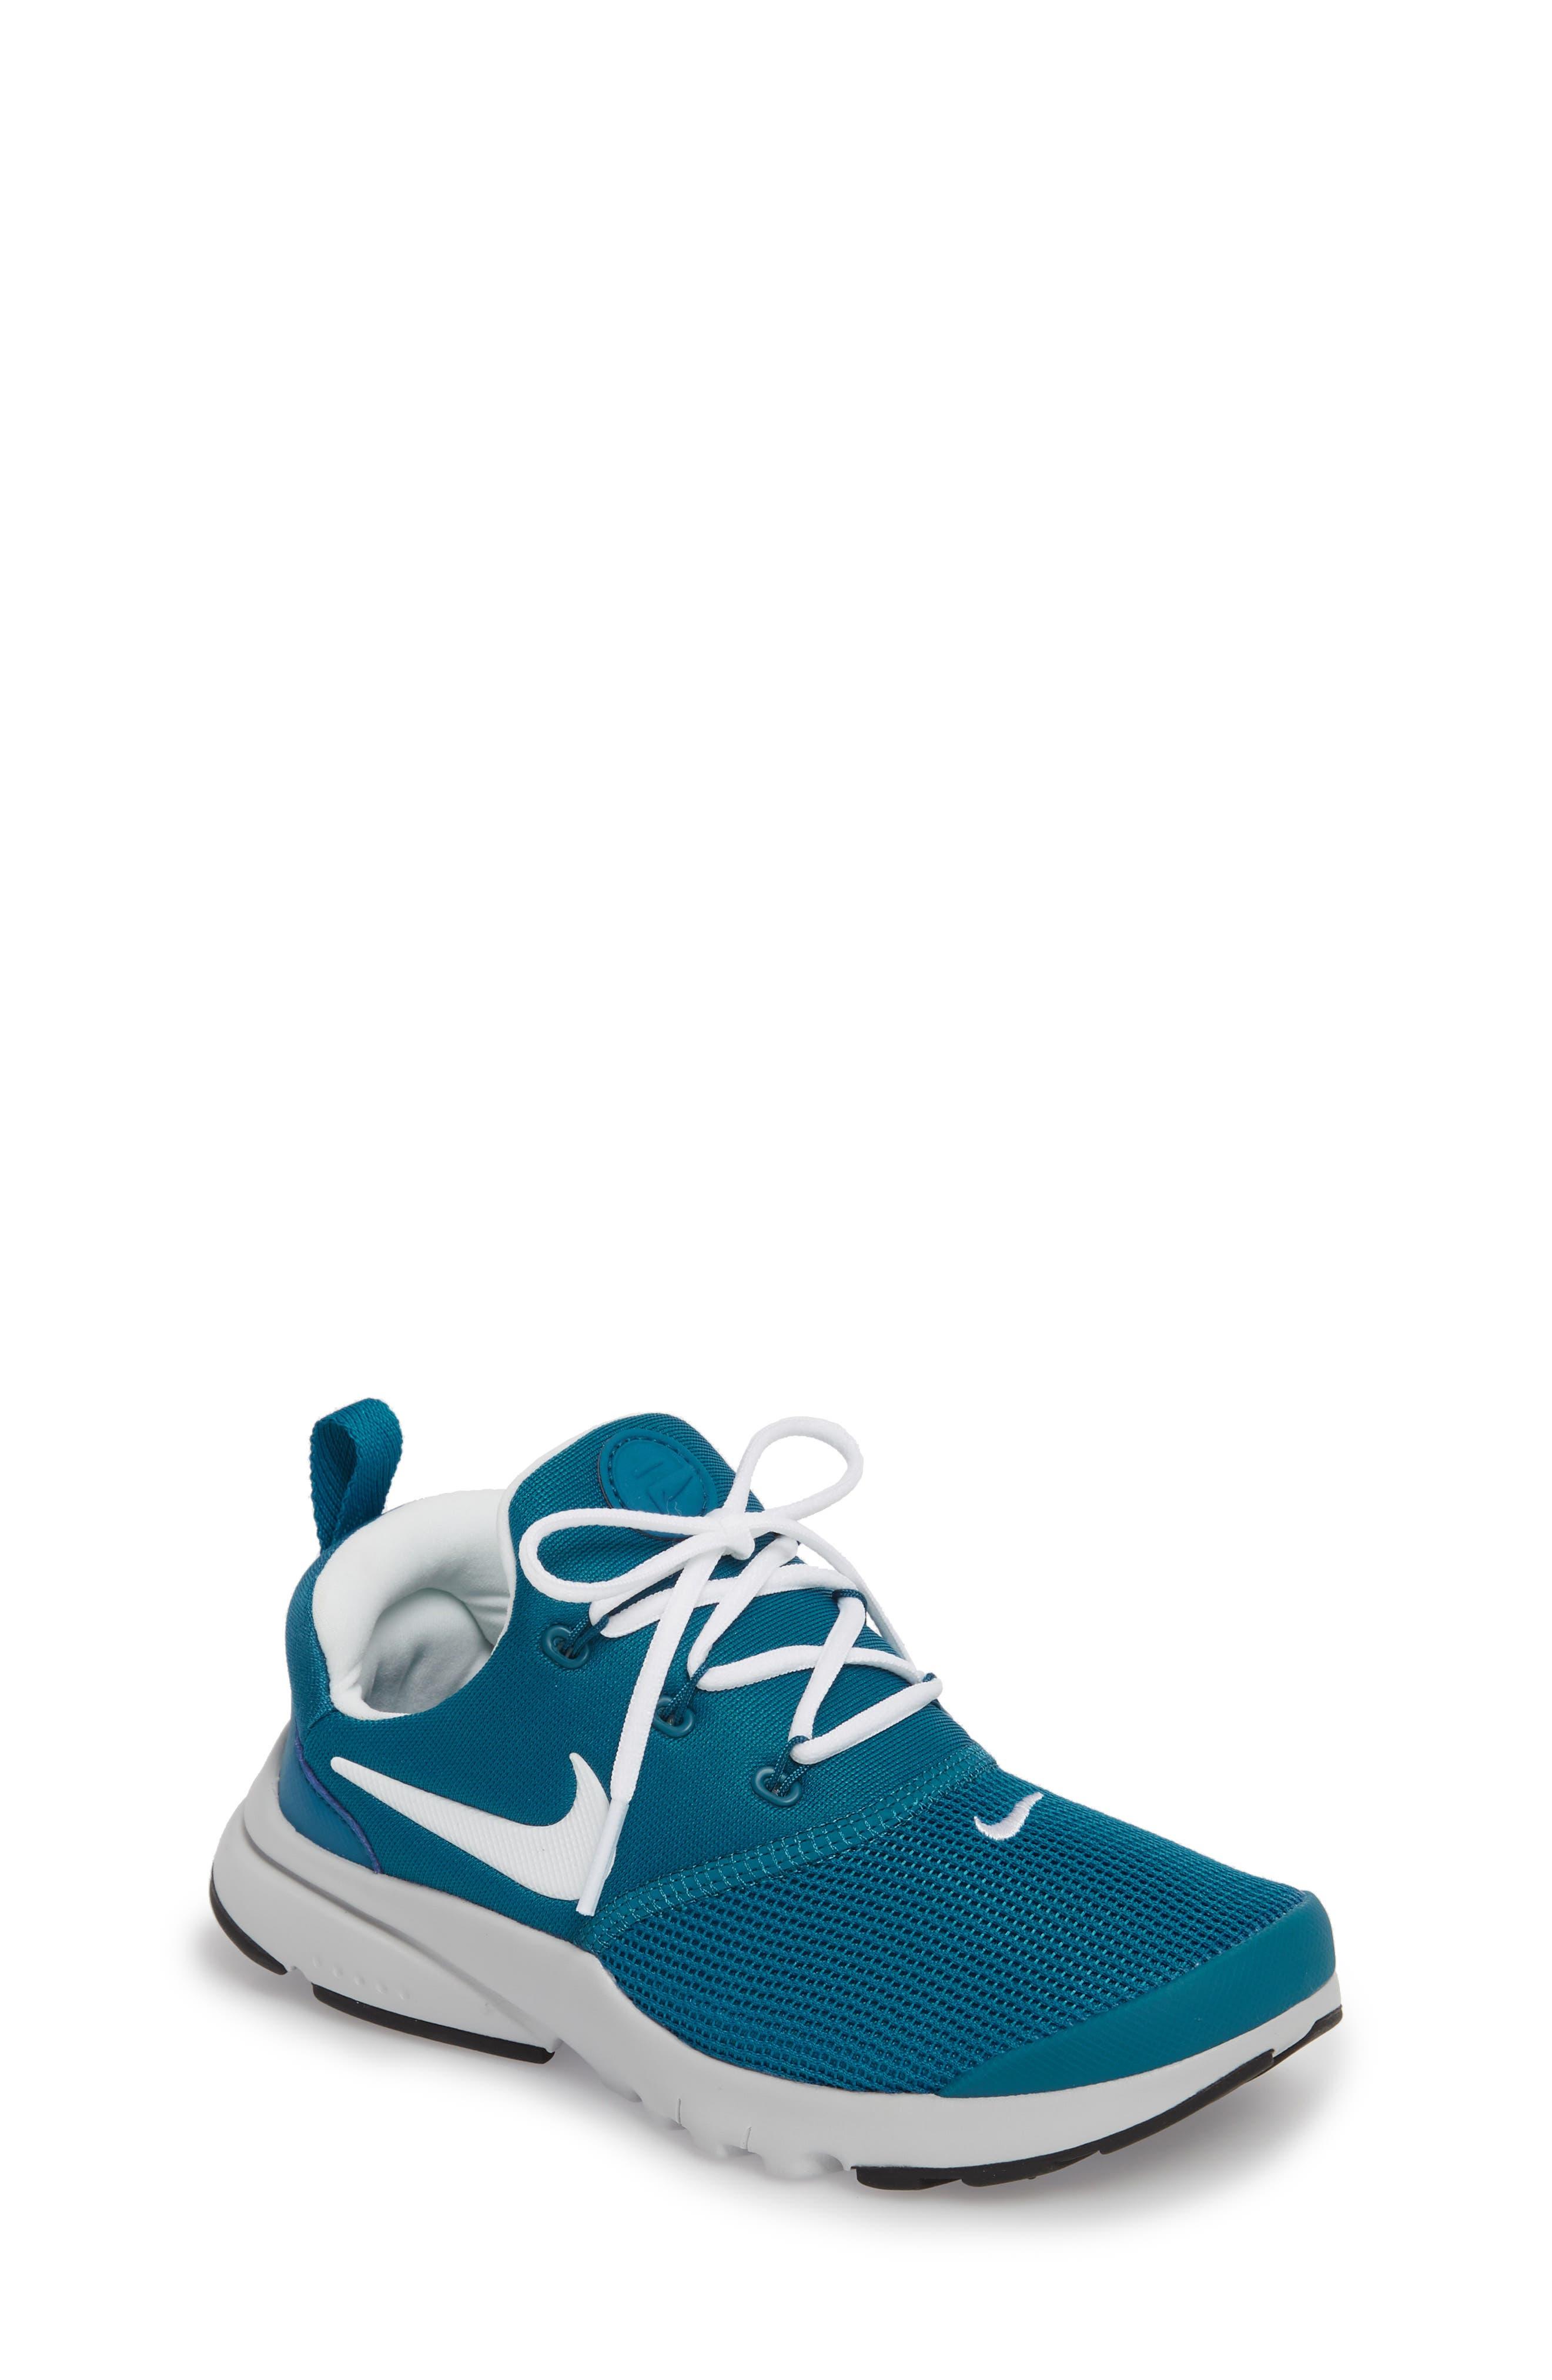 Presto Fly Sneaker,                         Main,                         color, Green Abyss/ Platinum/ Black